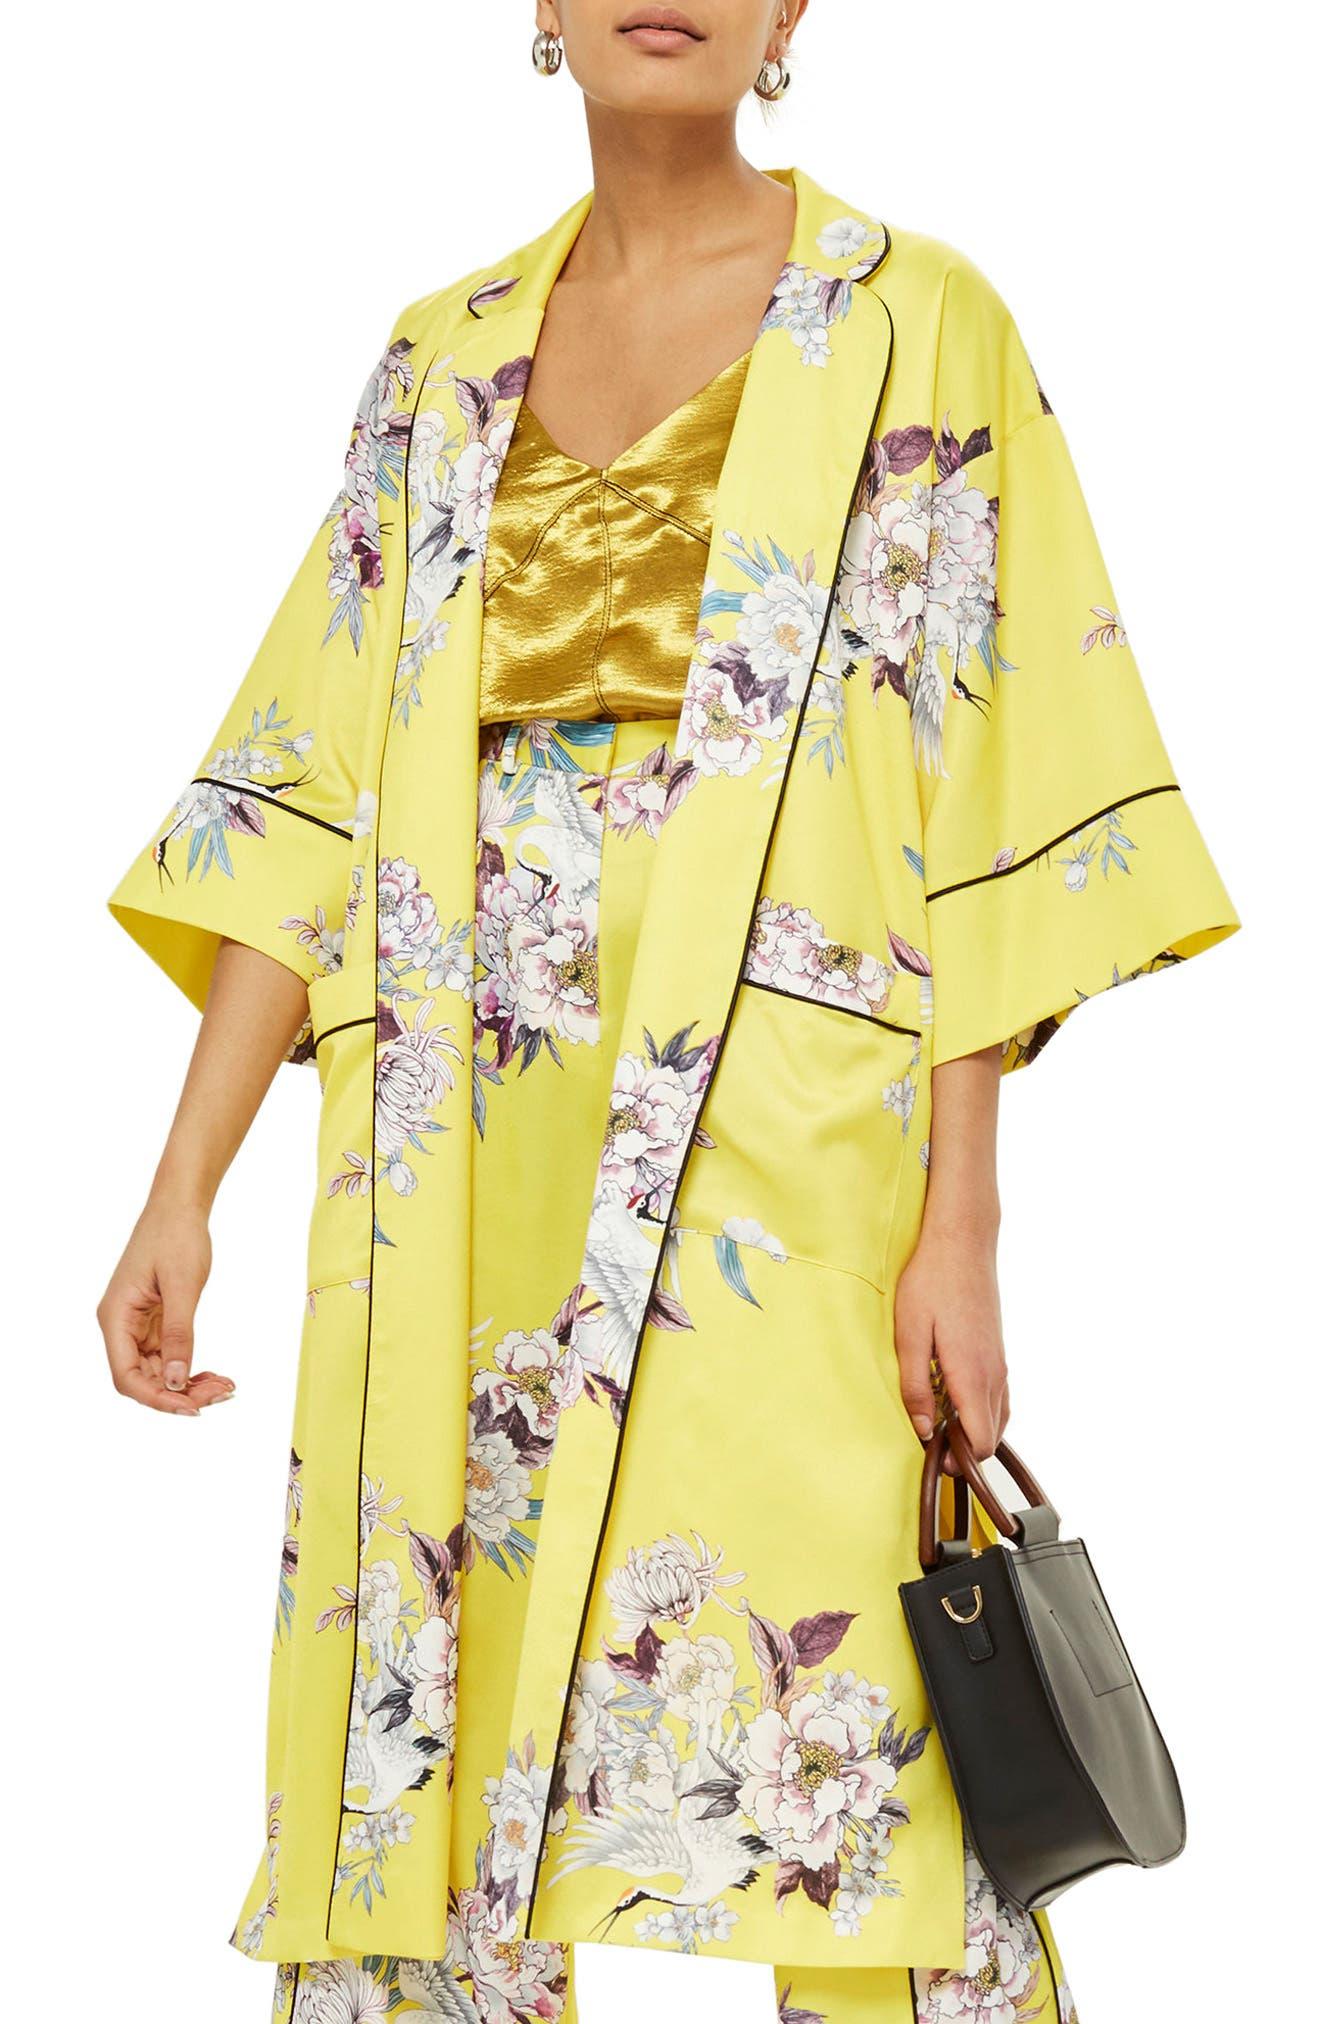 Heron Print Kimono,                         Main,                         color, Yellow Multi